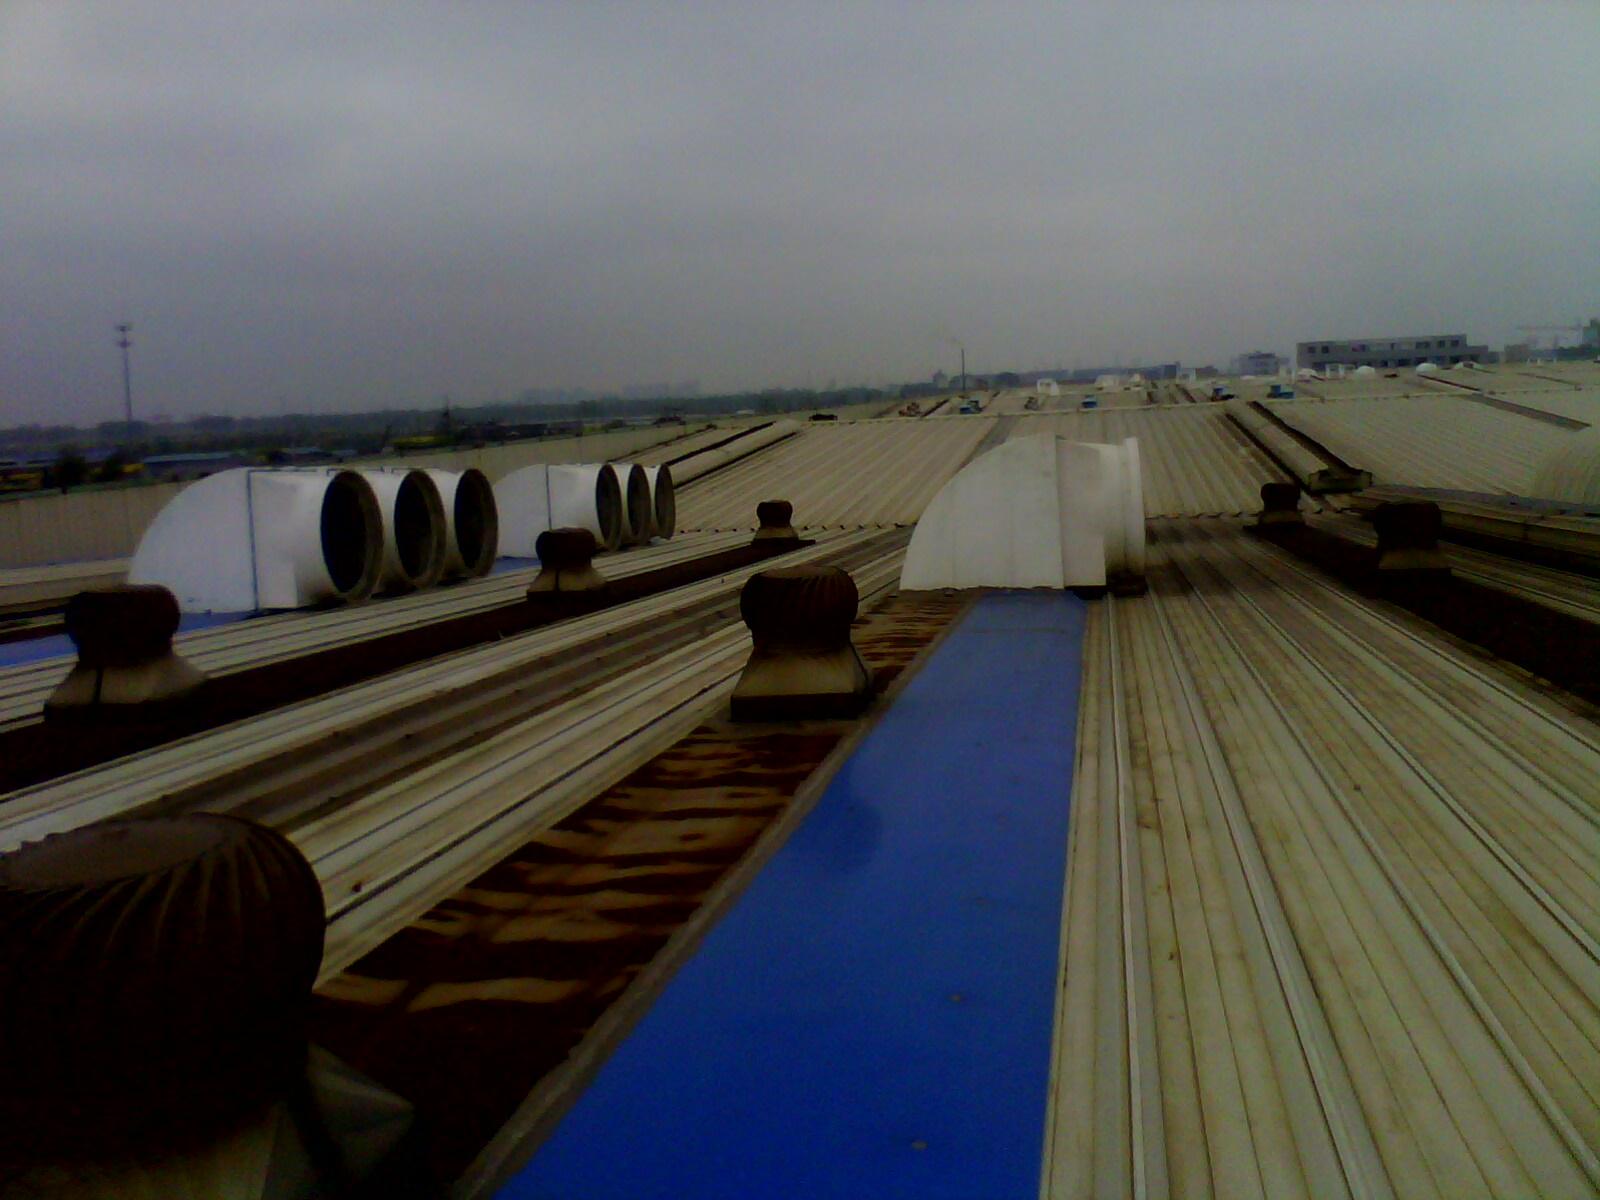 0。75KW,1450*1450*580mm,45000立方米/小时,6叶玻璃钢,可以屋顶安装,也可以墙壁 安装,带百叶窗和防护网。喇叭风机,喇叭扇,负压排风扇,负压排风机